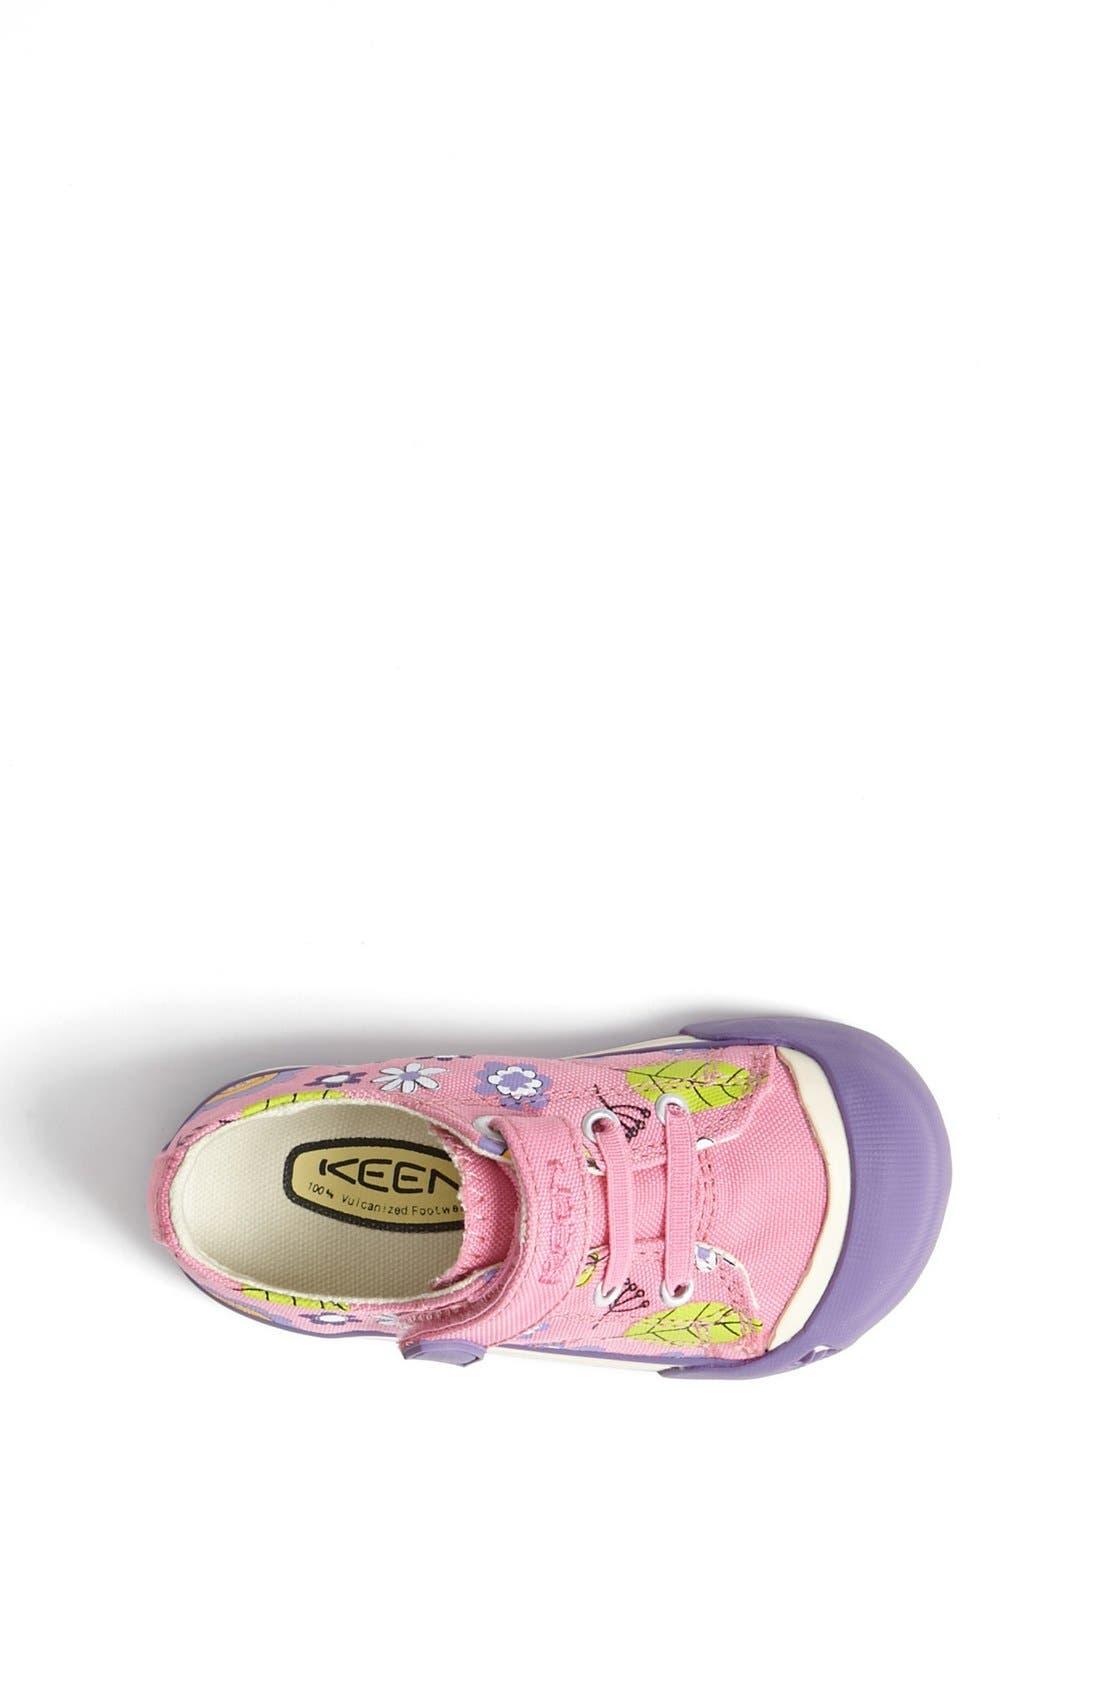 Alternate Image 3  - Keen 'Coronado' Print Sneaker (Baby, Walker, Toddler & Little Kid)